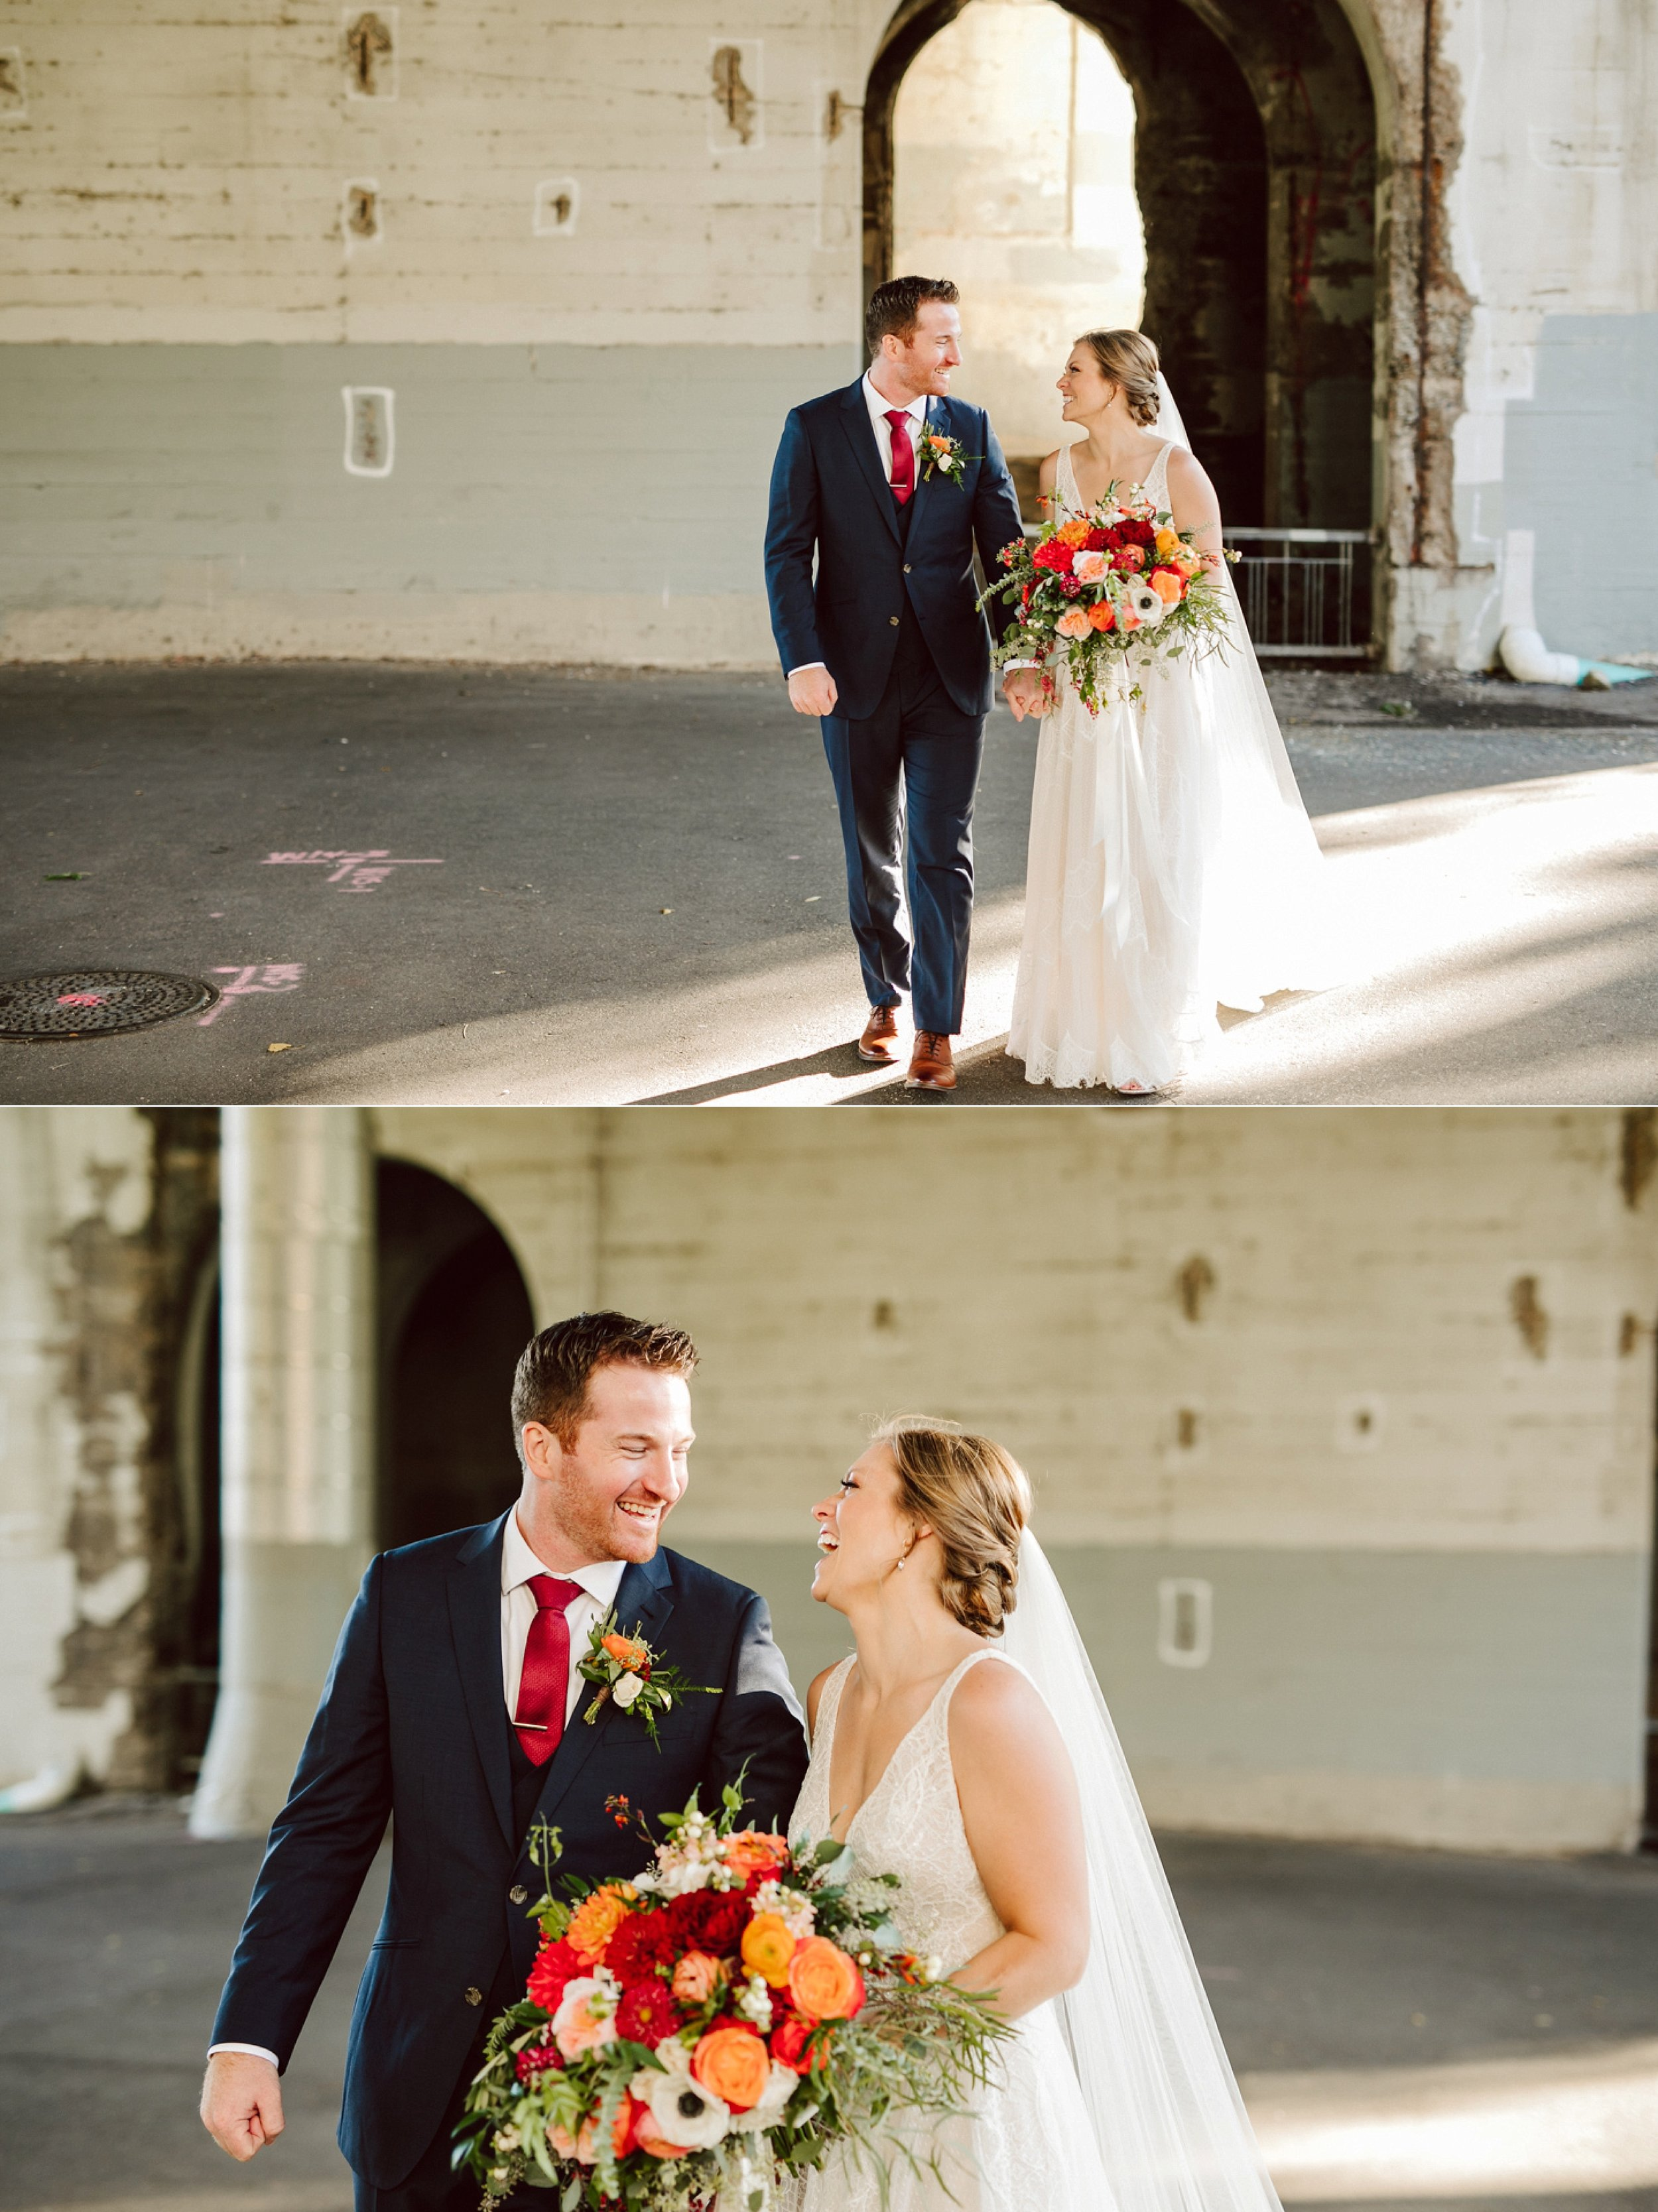 Nicollet-Island-Pavilion-Minneapolis-September-Coral-Navy-Wedding-63.jpg